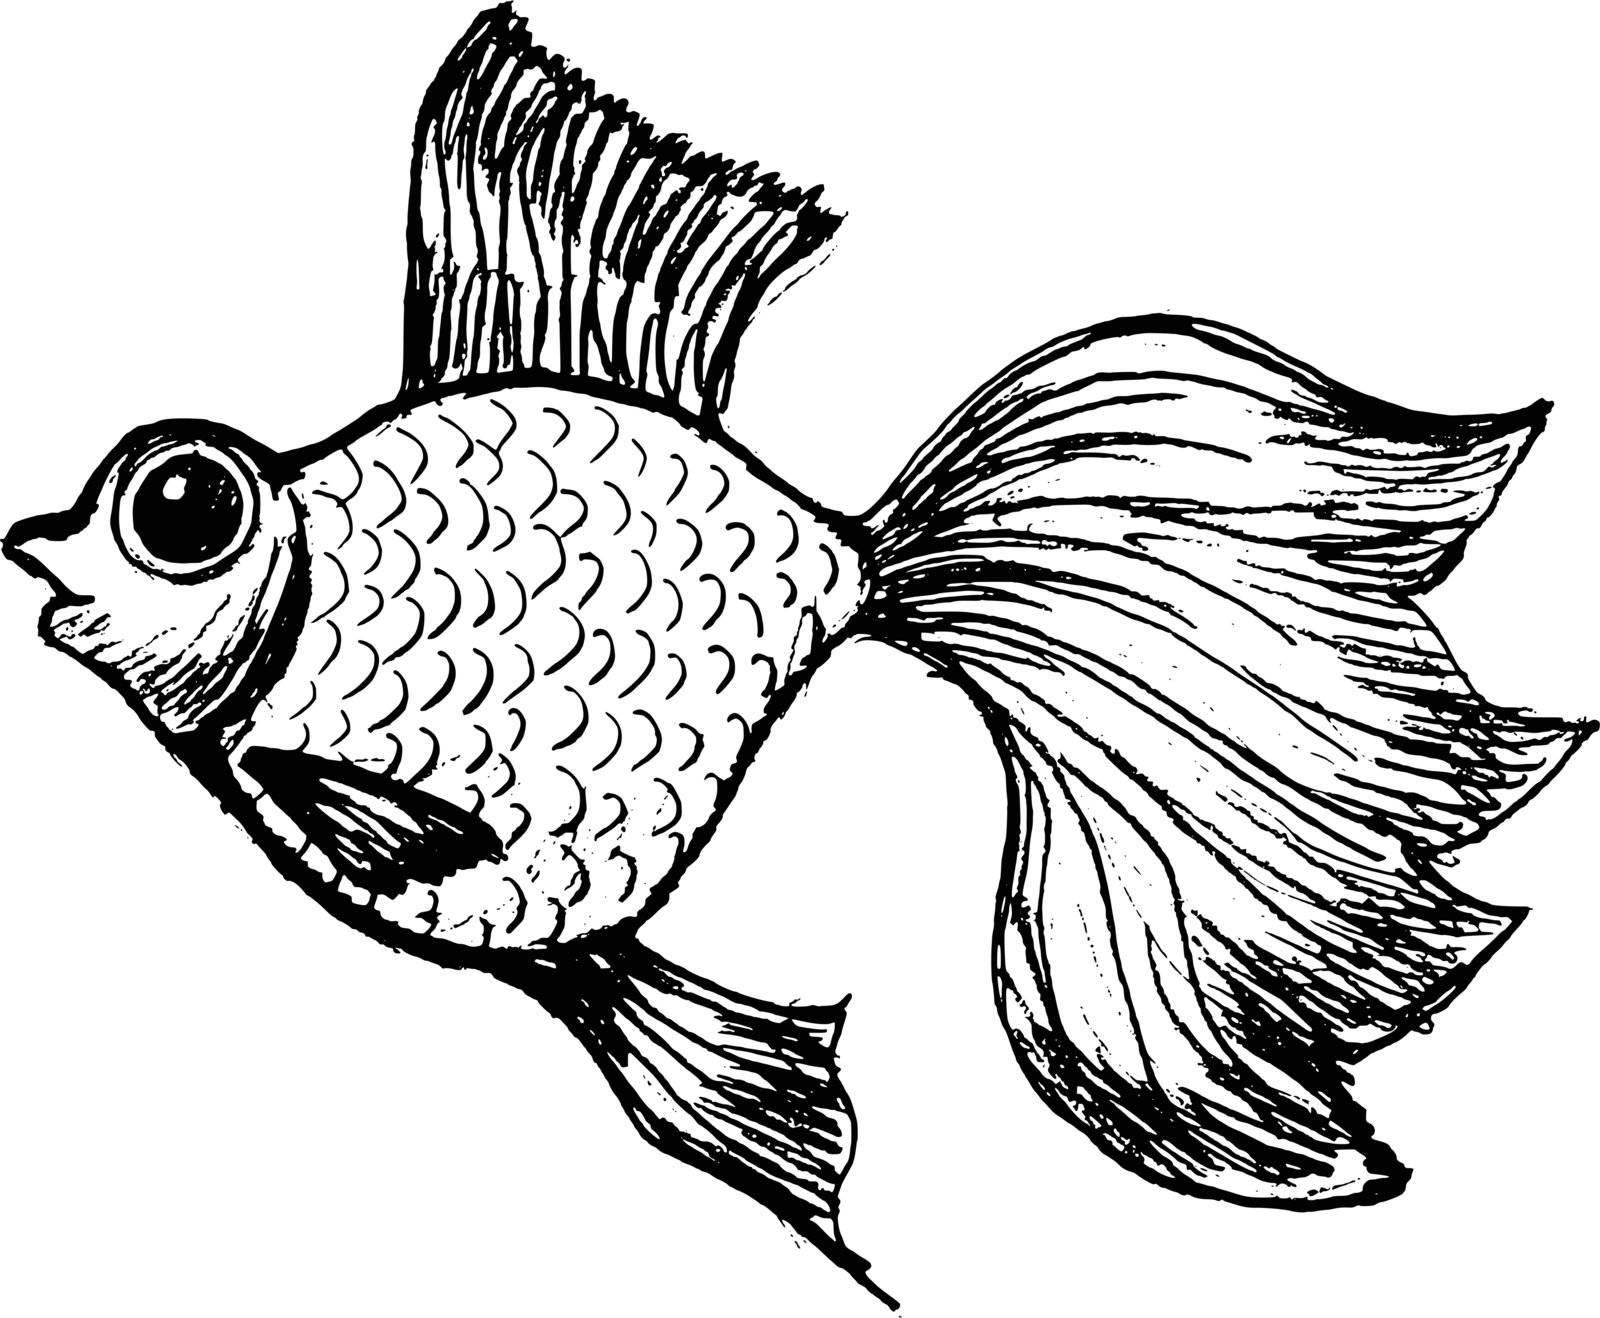 hand drawn, vector, sketch illustration of goldfish